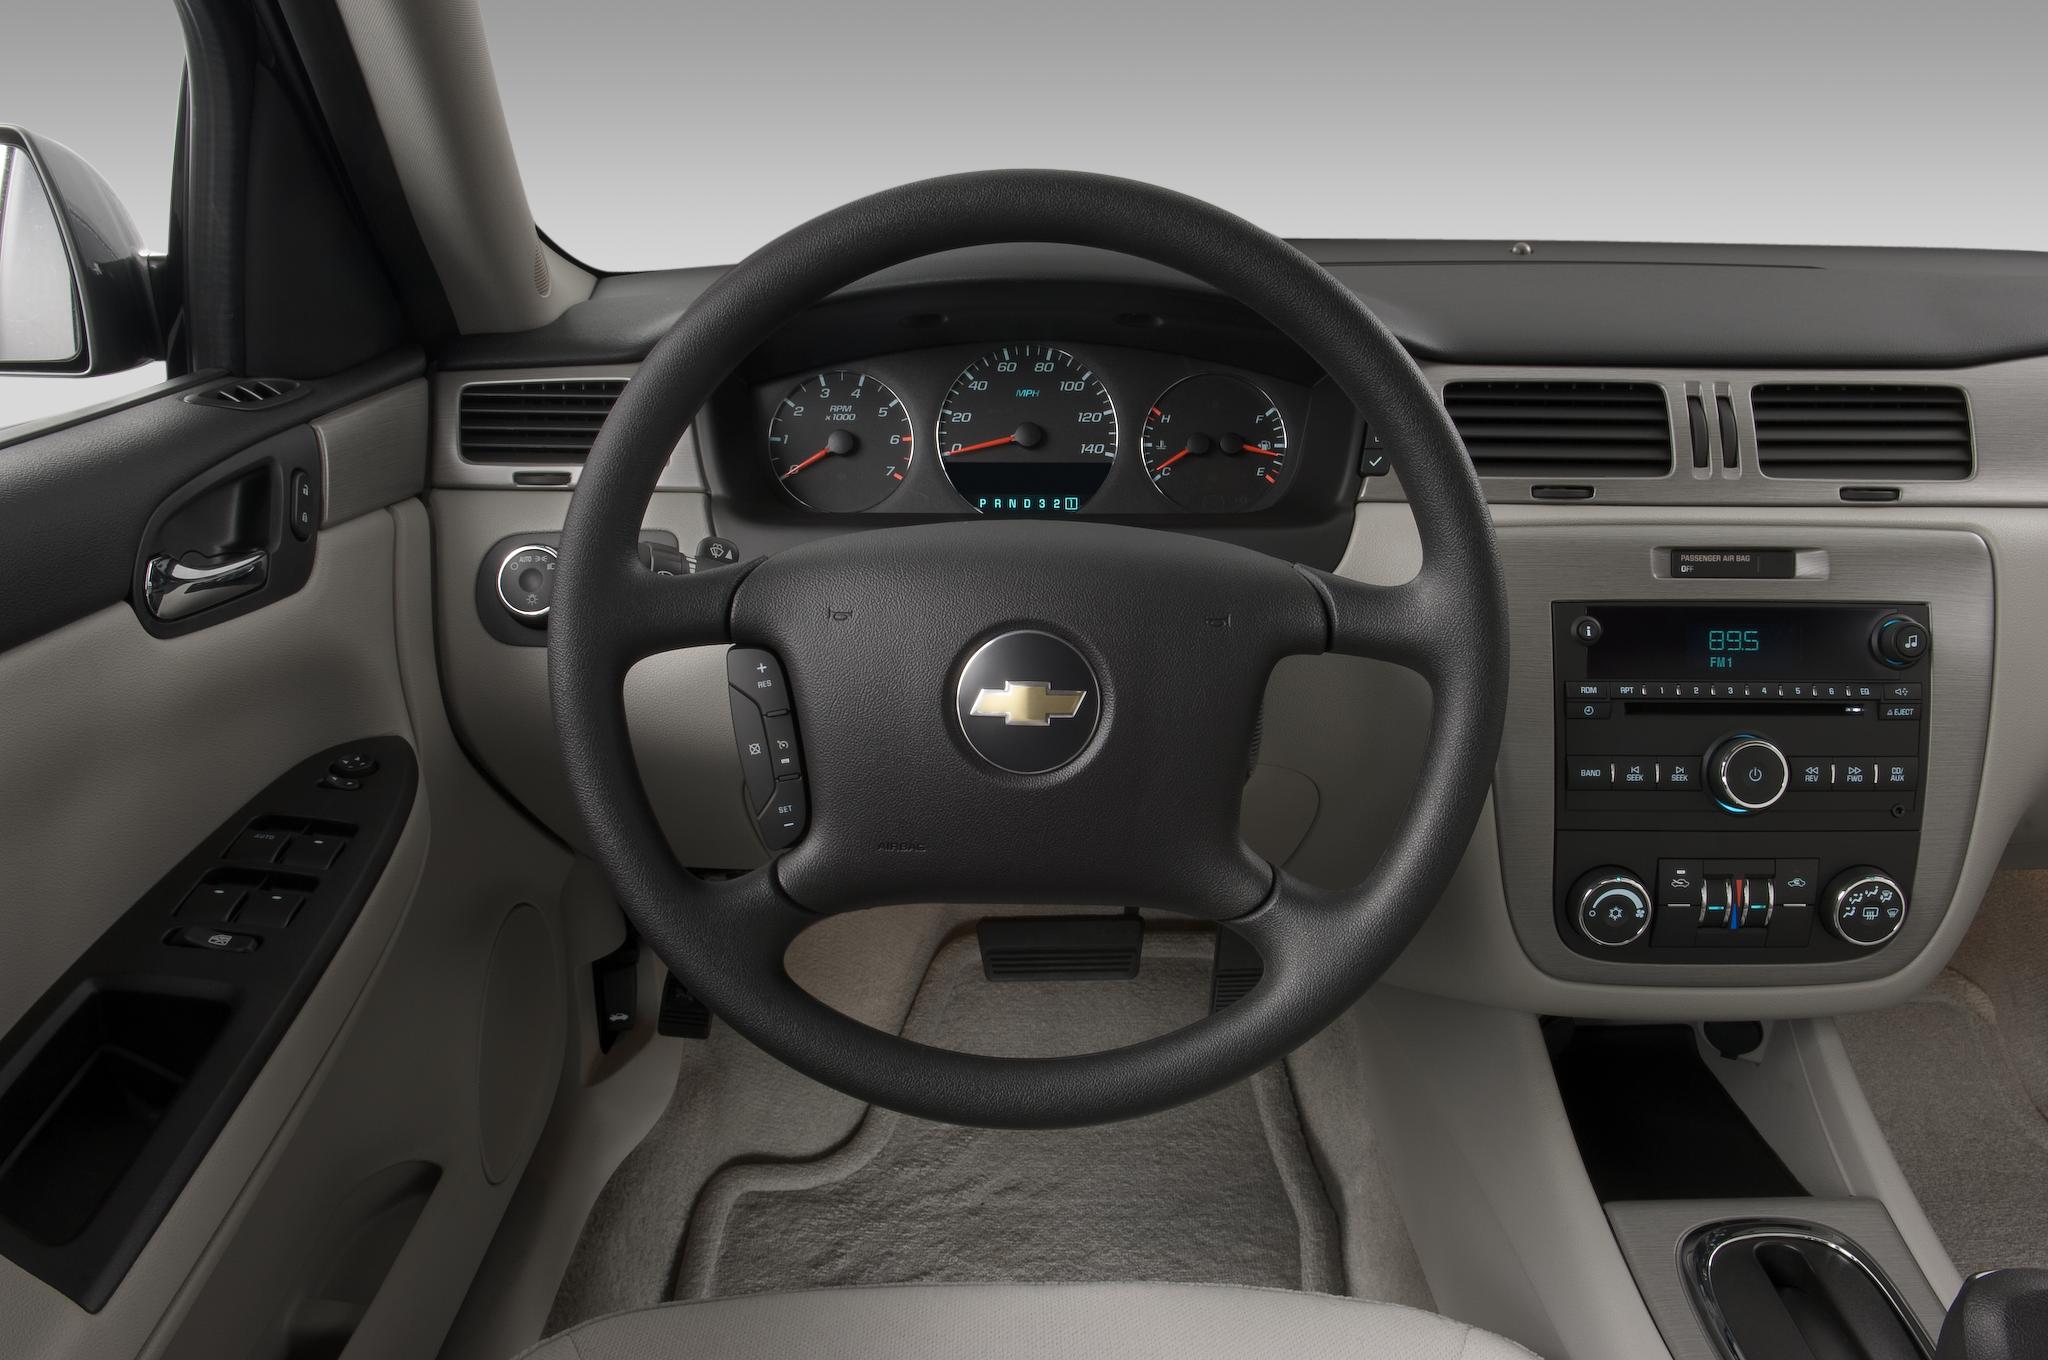 Should chevrolet produce an impala ss for Chevrolet impala 2013 interior